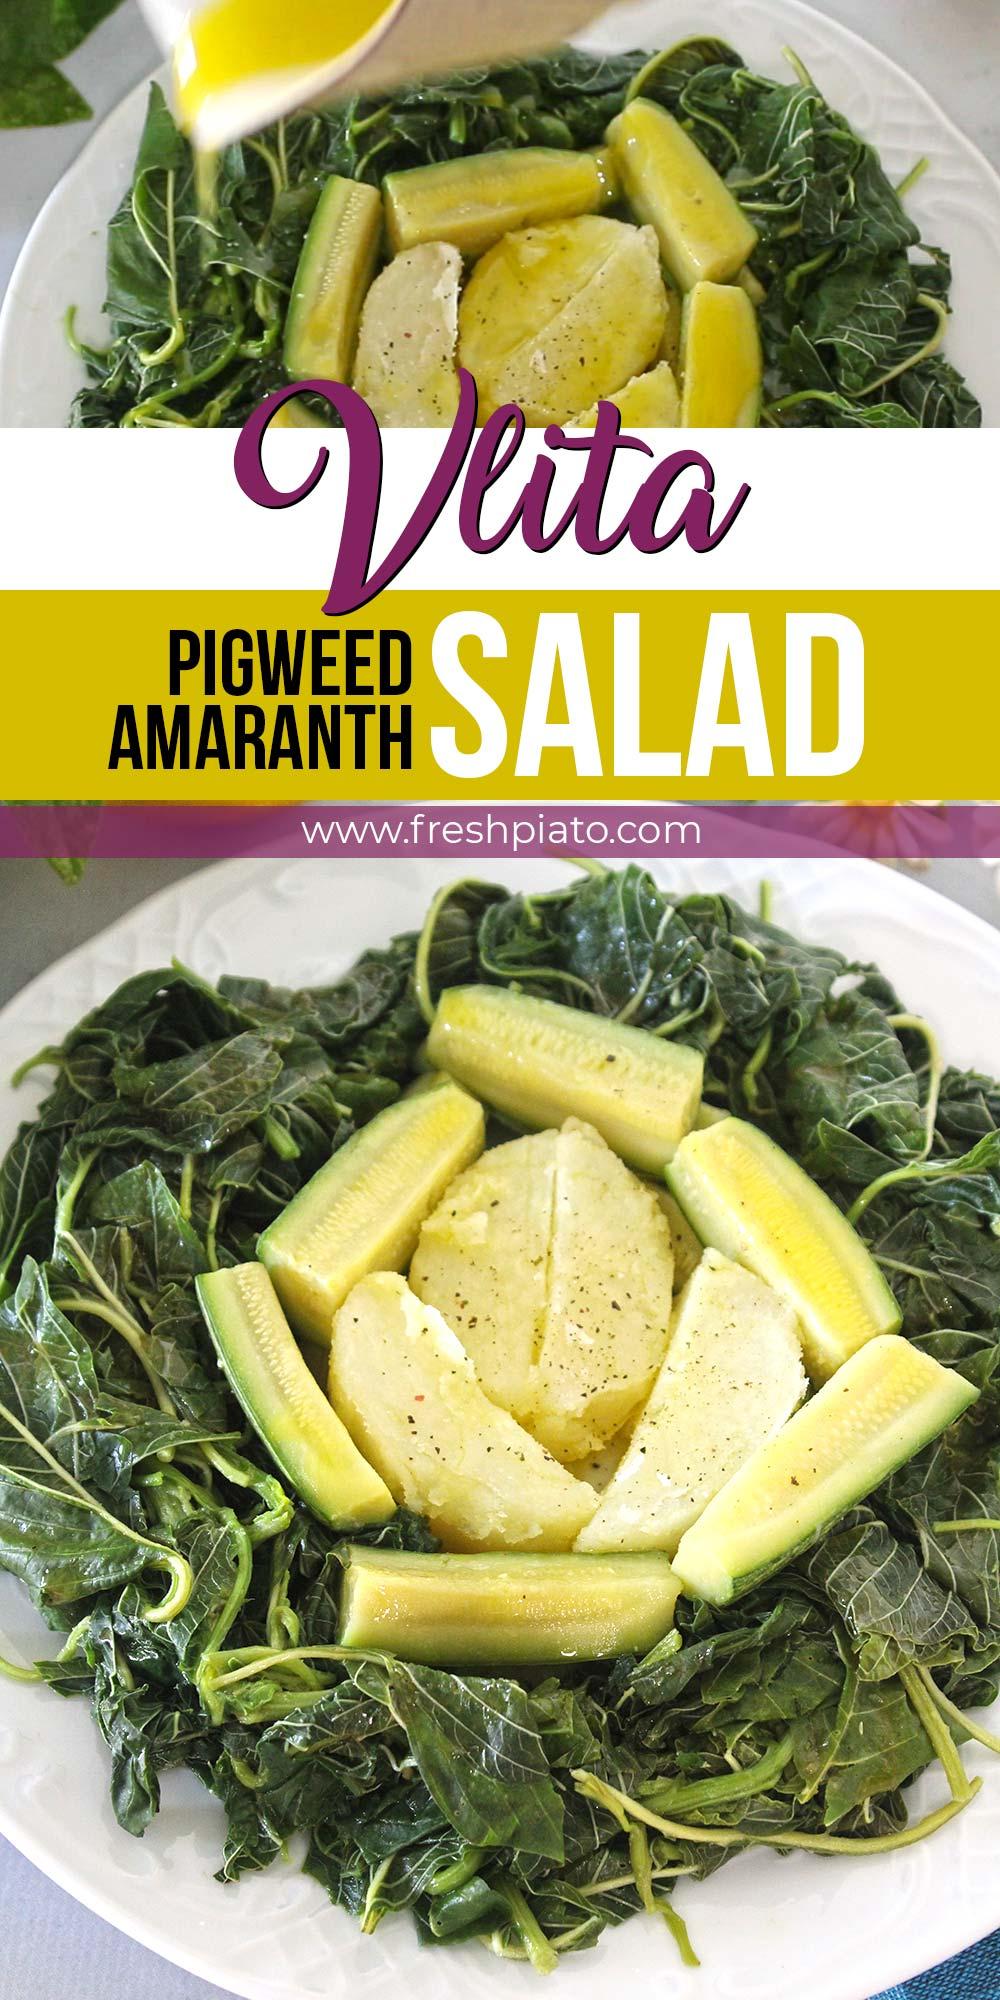 vlita, amaranth, pigweed salad recipe